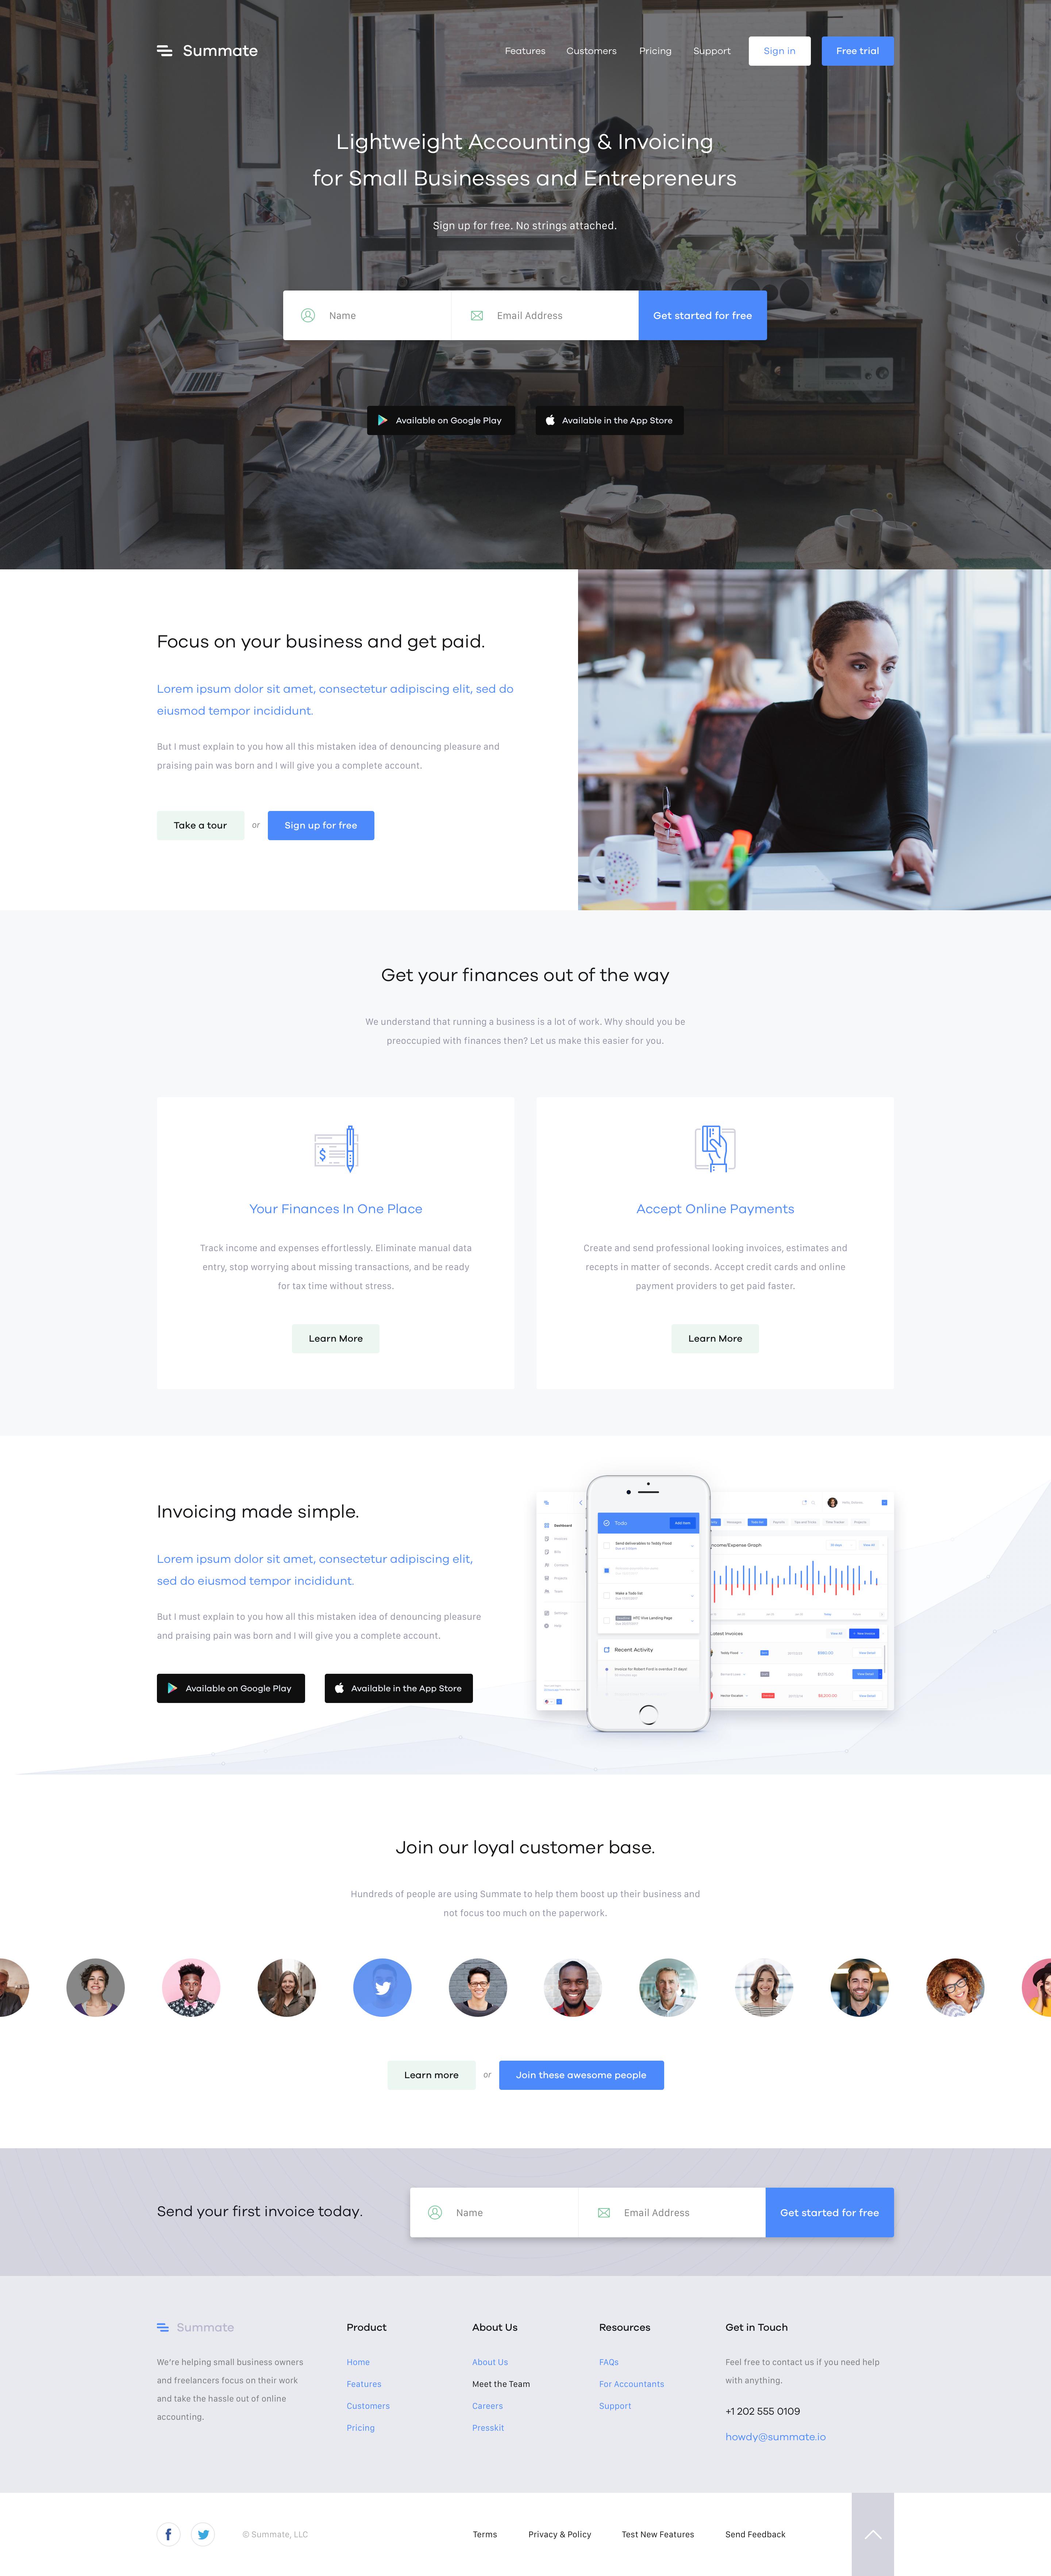 Summate Homepage Web Design Websites Web Design Examples Simple Website Design